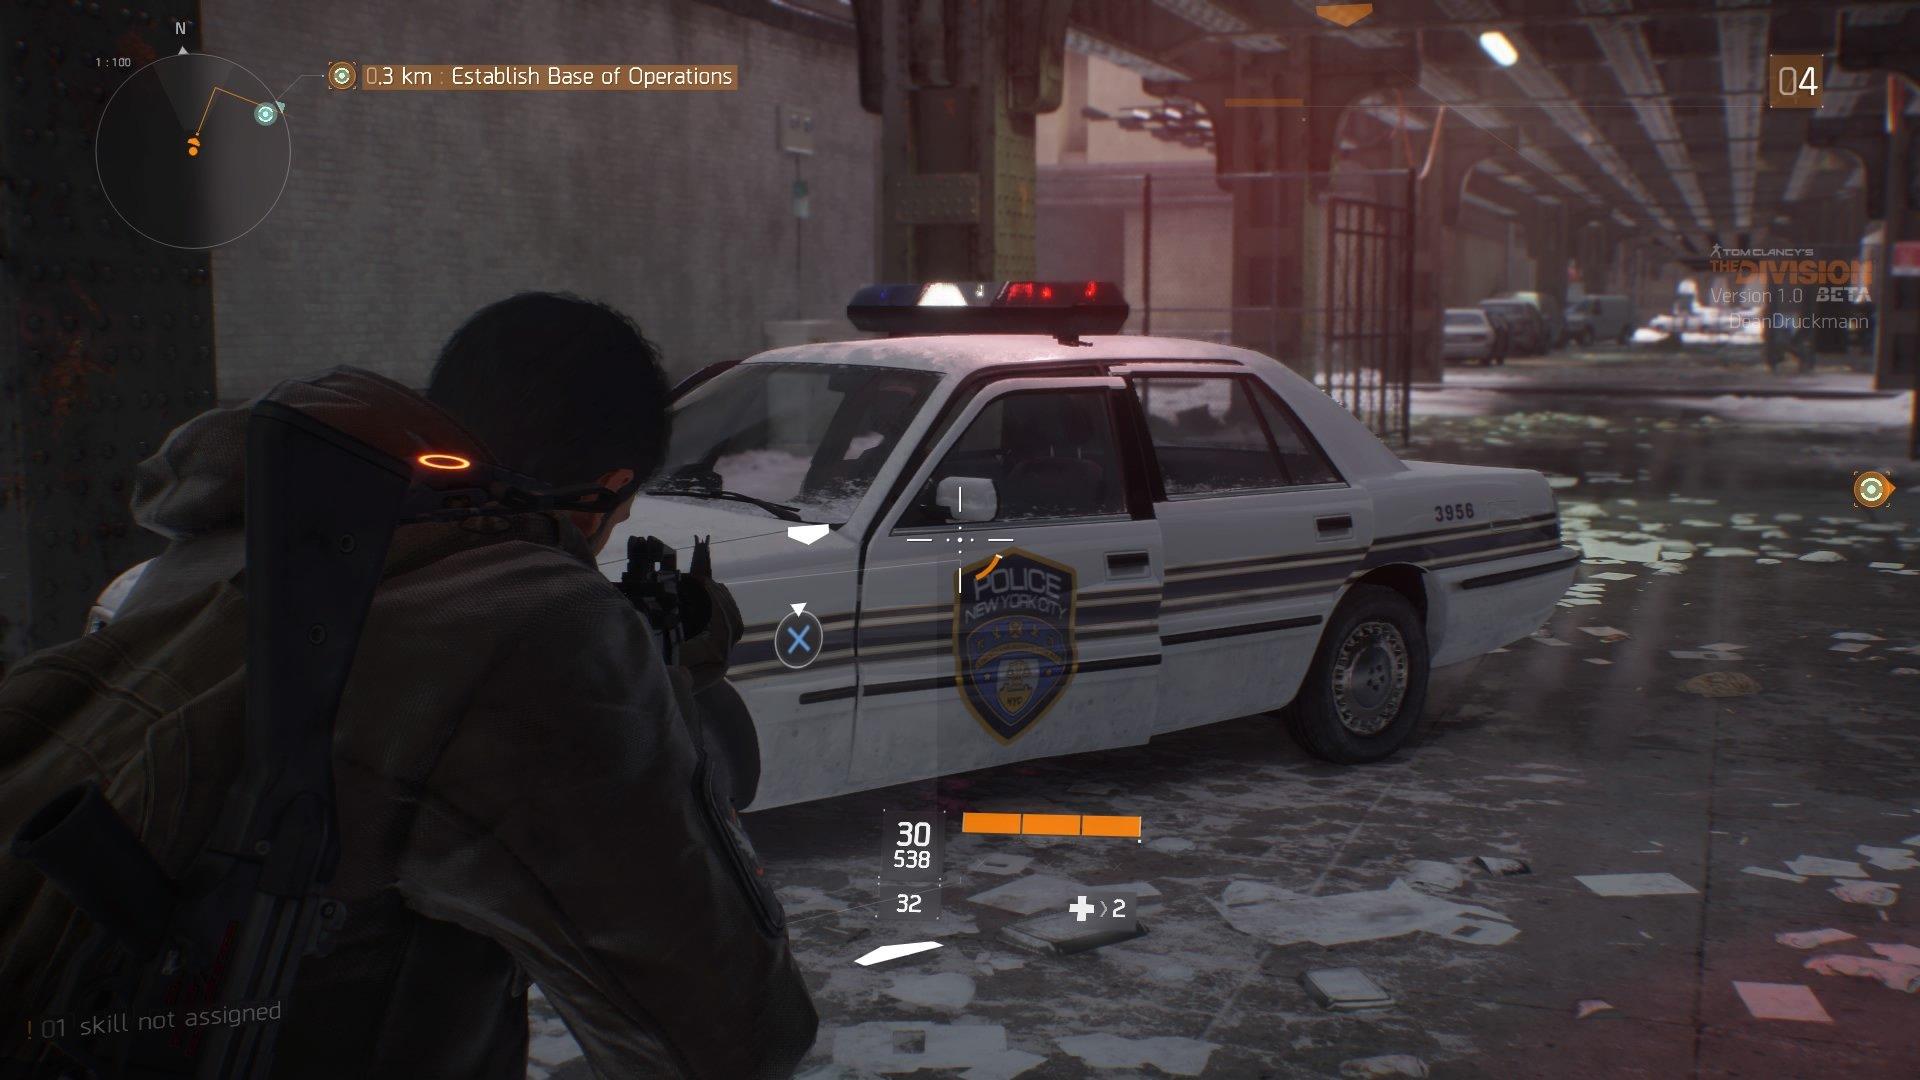 Beta Tom Clancy's The Division™ После 17 часов - Изображение 7